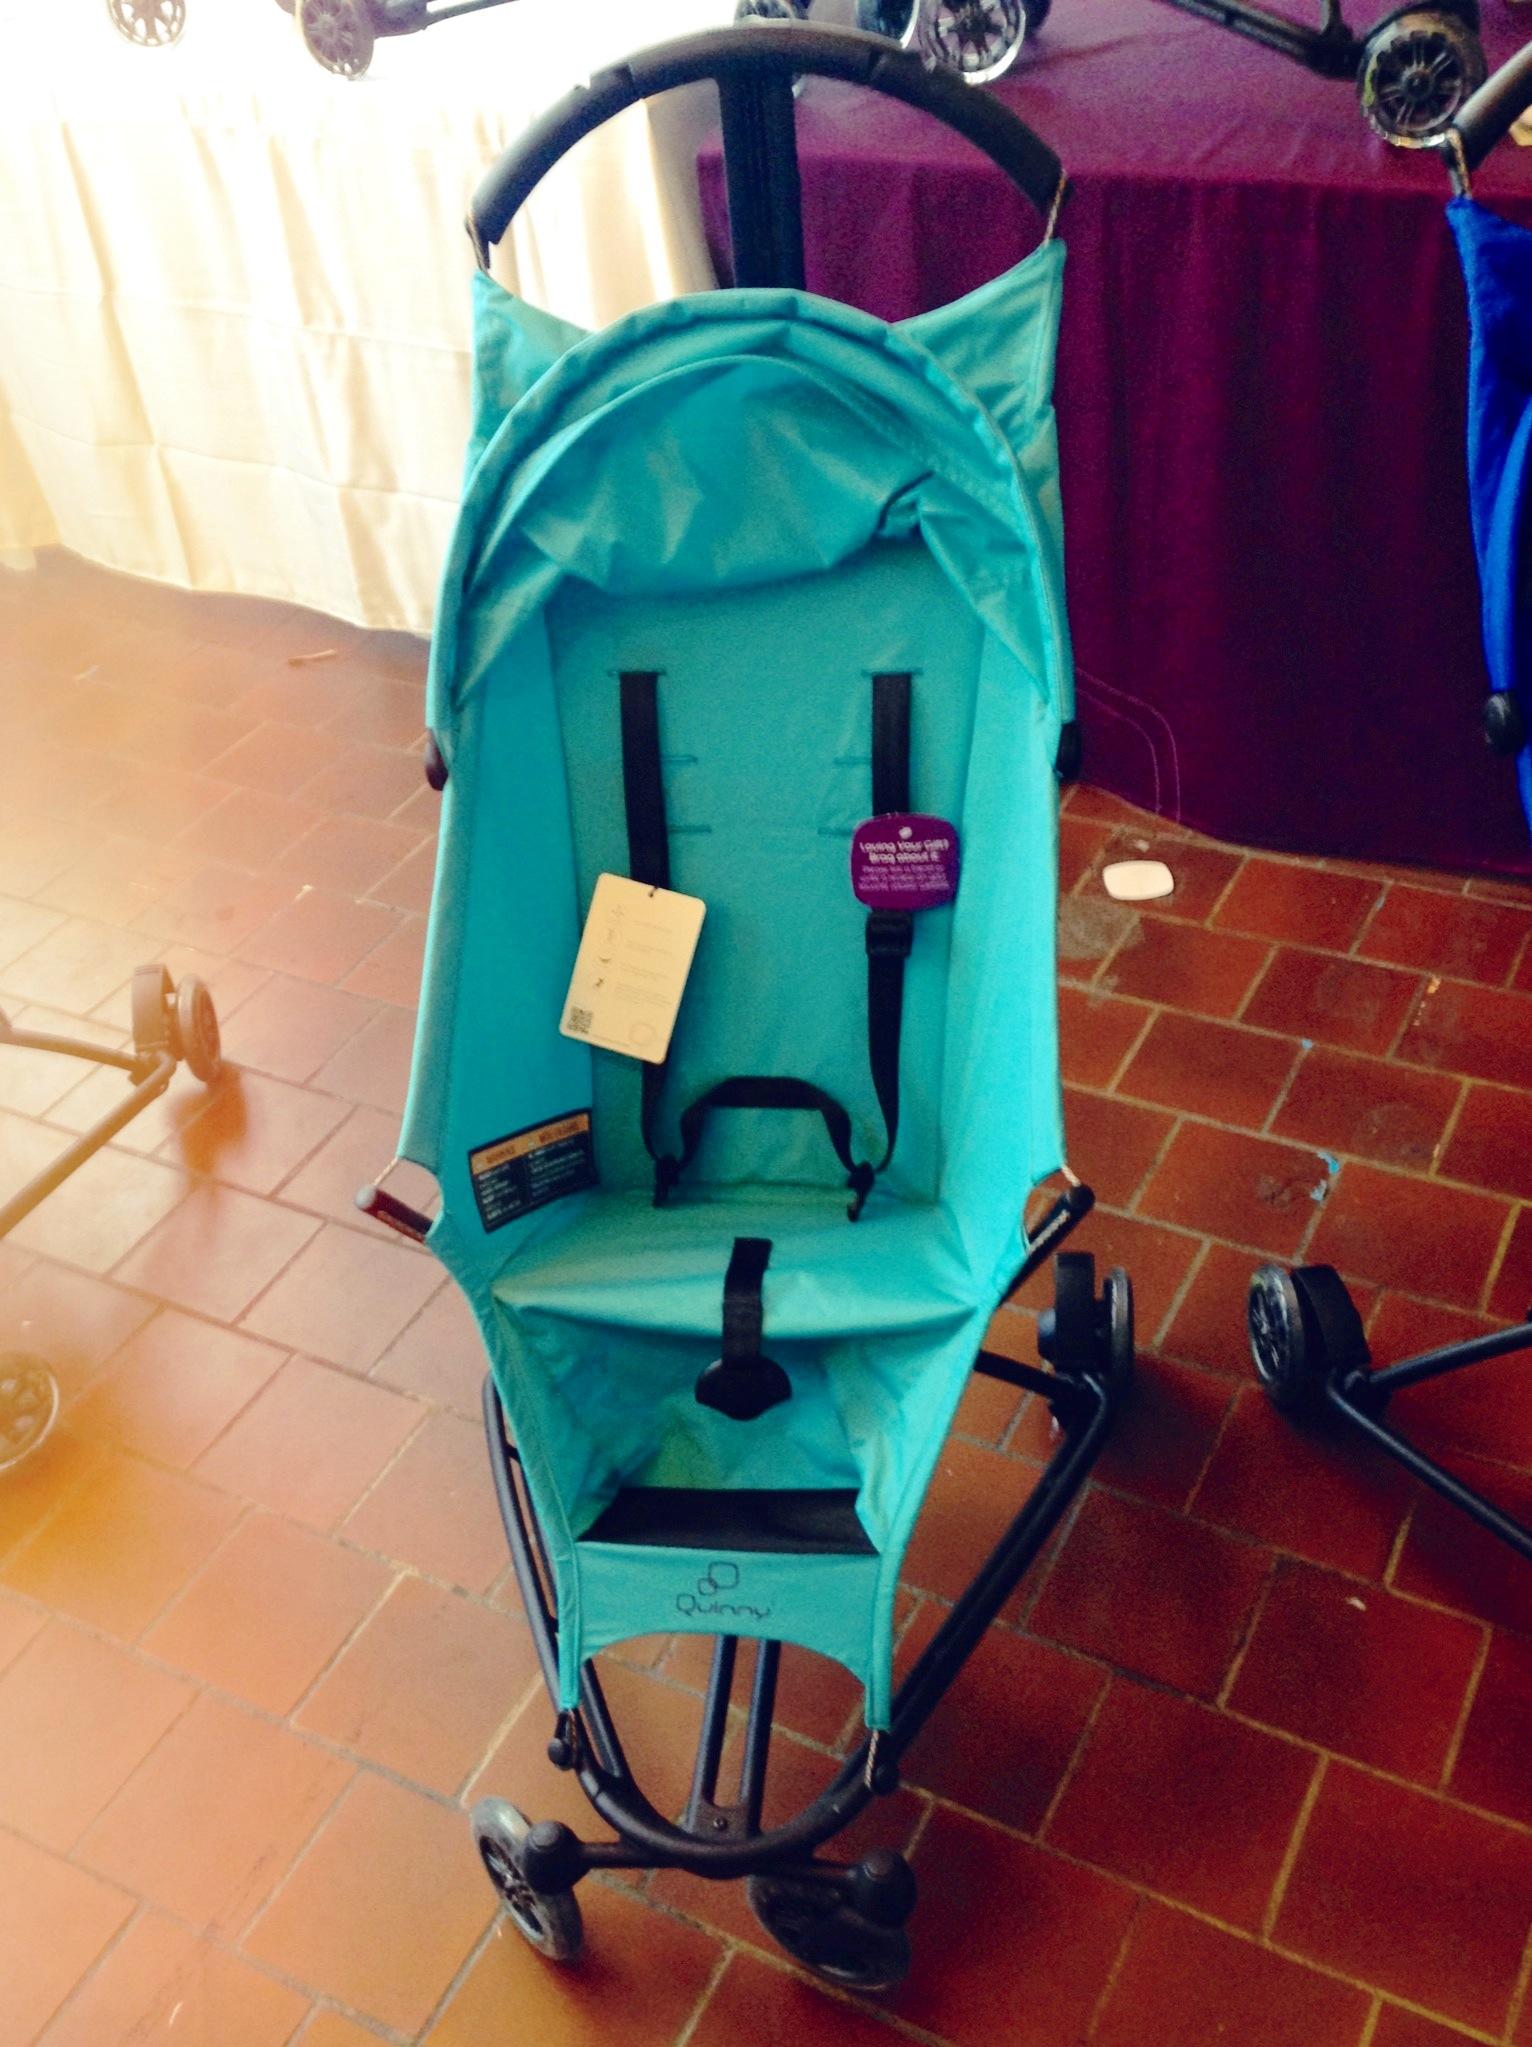 Stroller Review: Quinny Yezz Lightweight Stroller | My ...